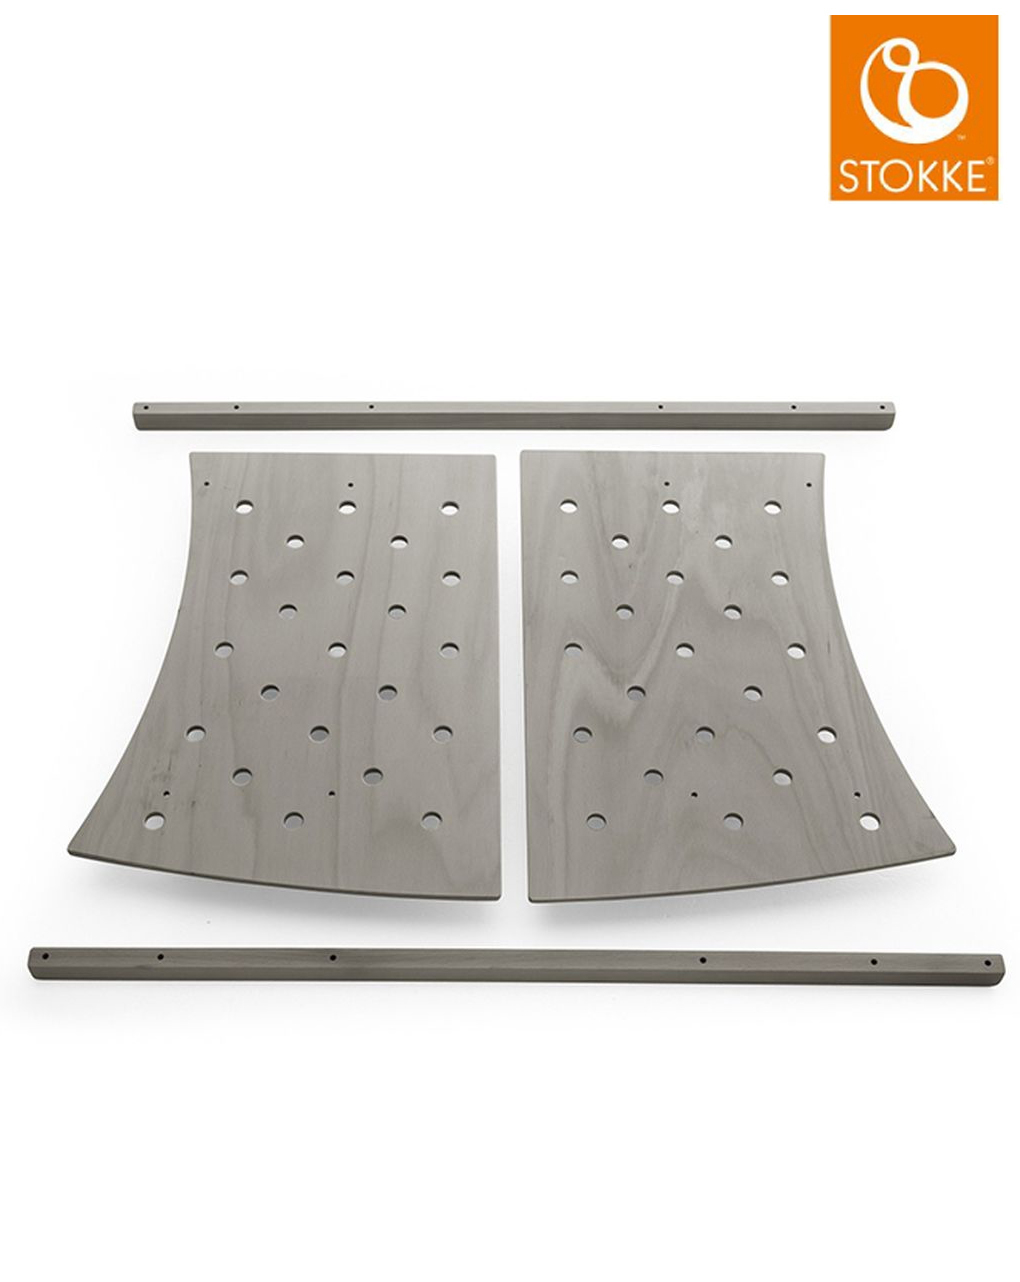 Stokke® sleepi™ estensione junior - hazy grey - Stokke